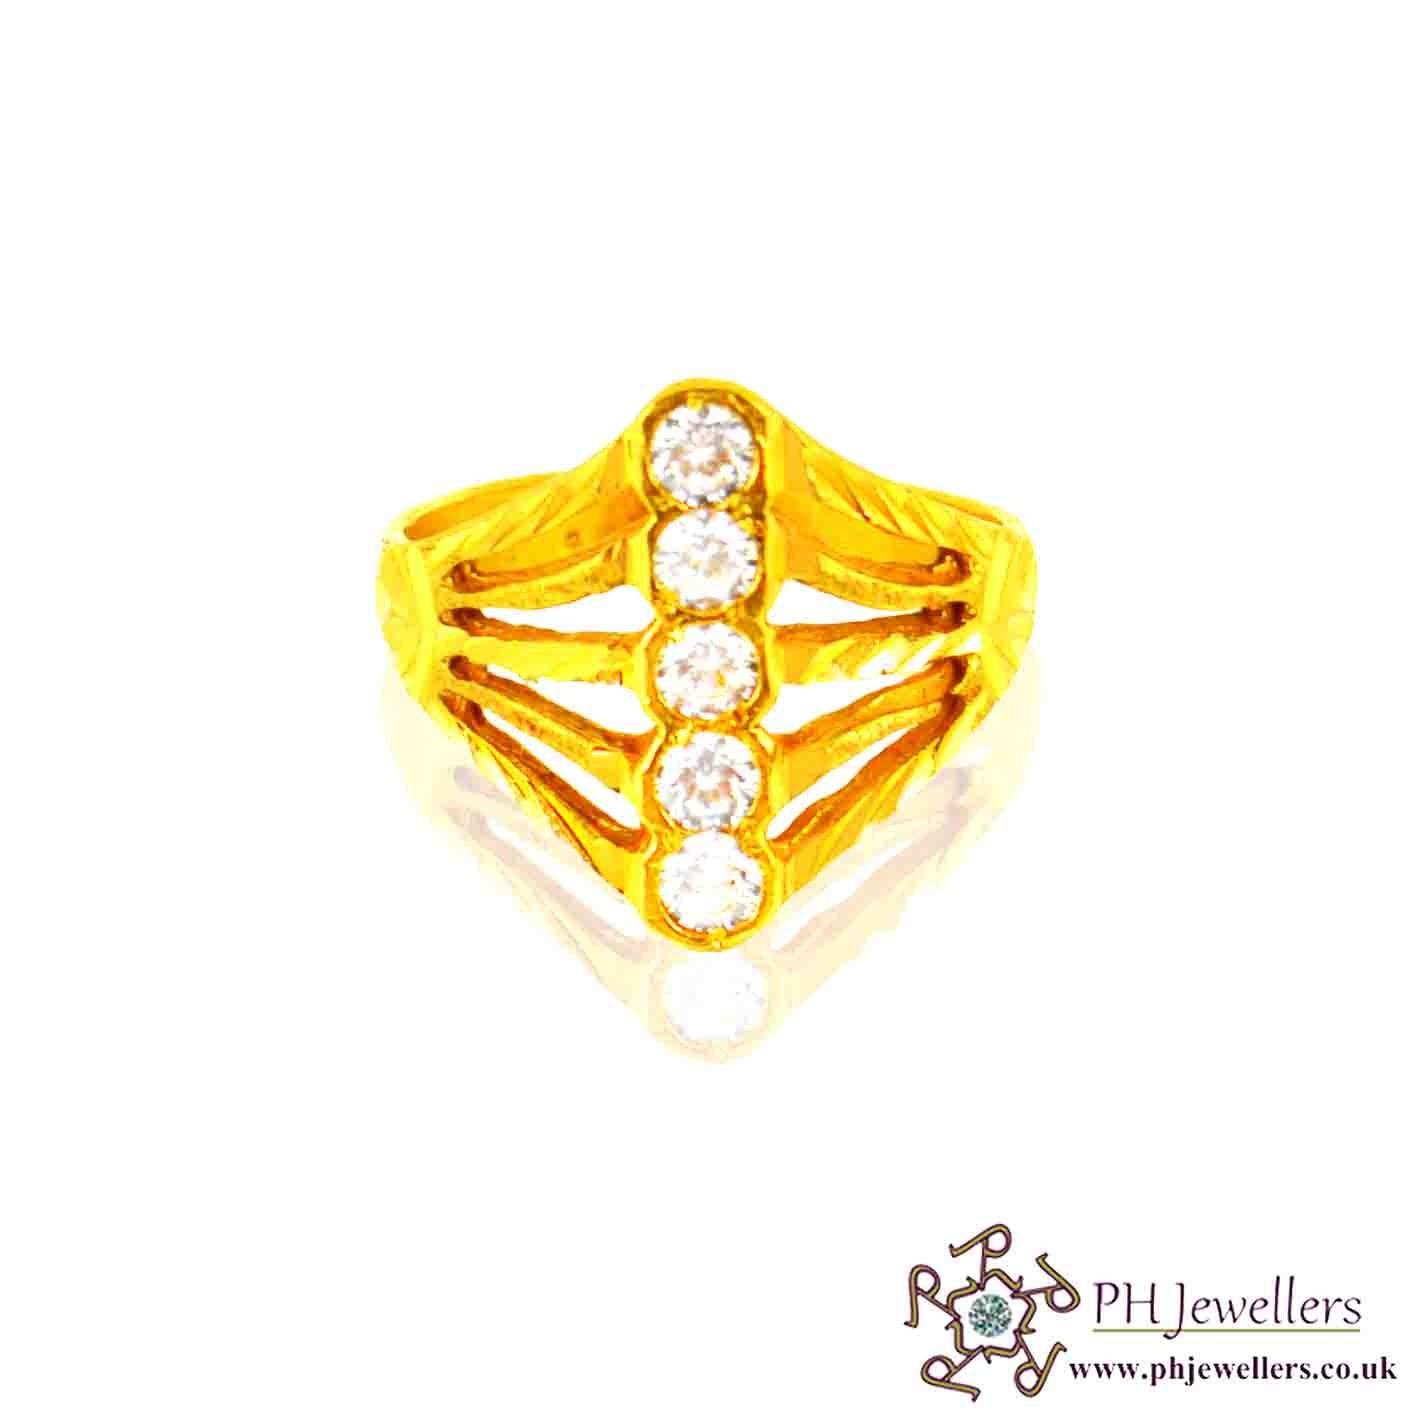 22ct 916 Hallmark Yellow Gold Long Size N Ring CZ SR36